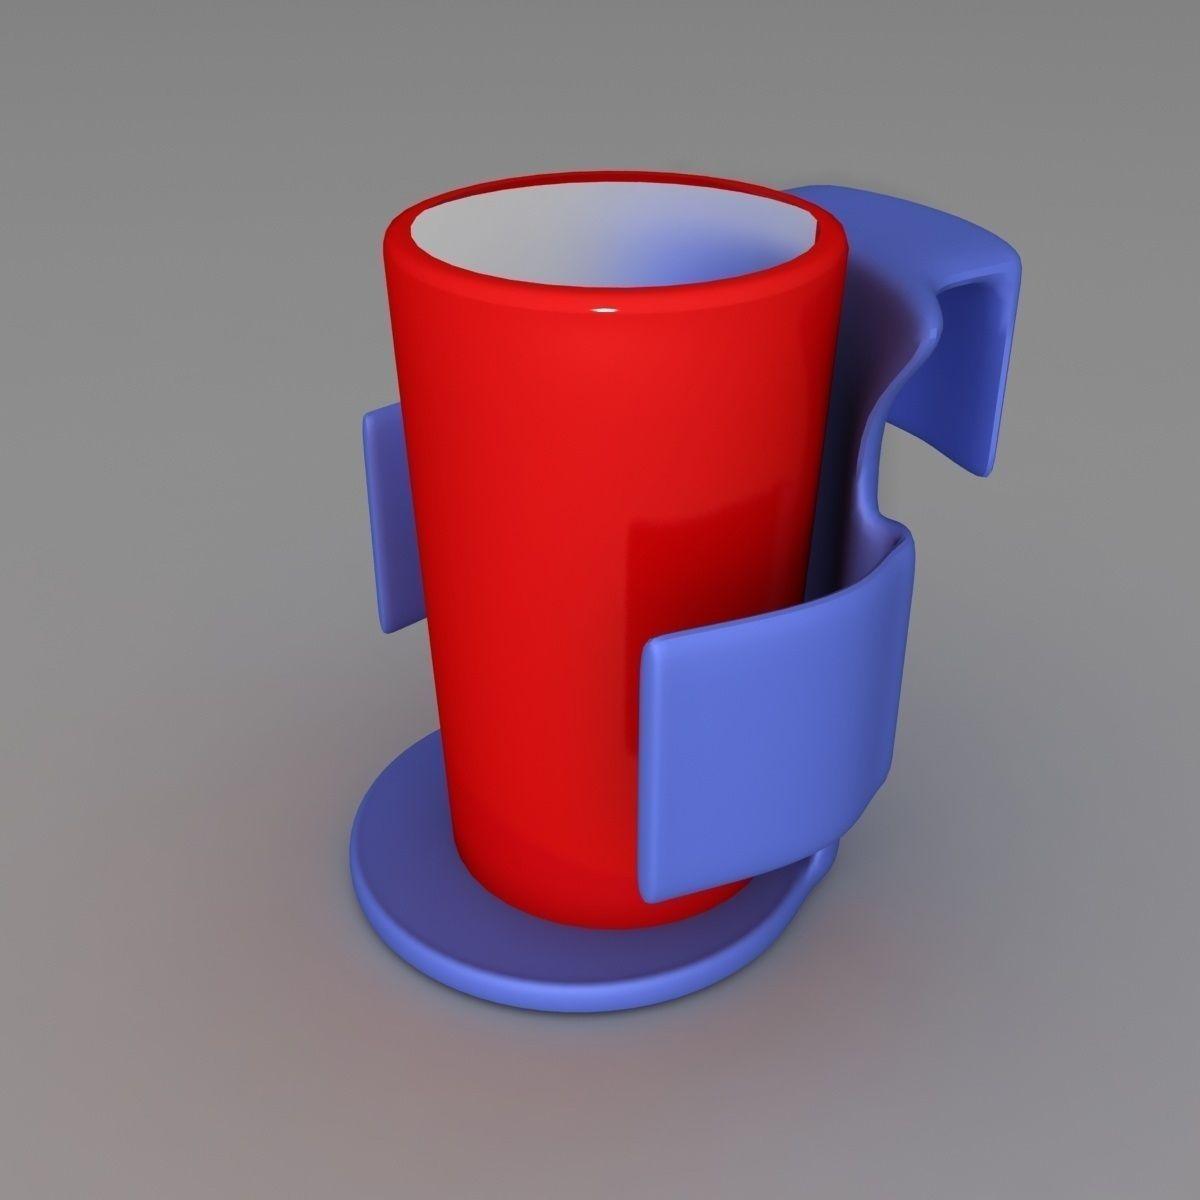 Car Cup Holder 3d Model 3d Printable Stl Cgtrader Com